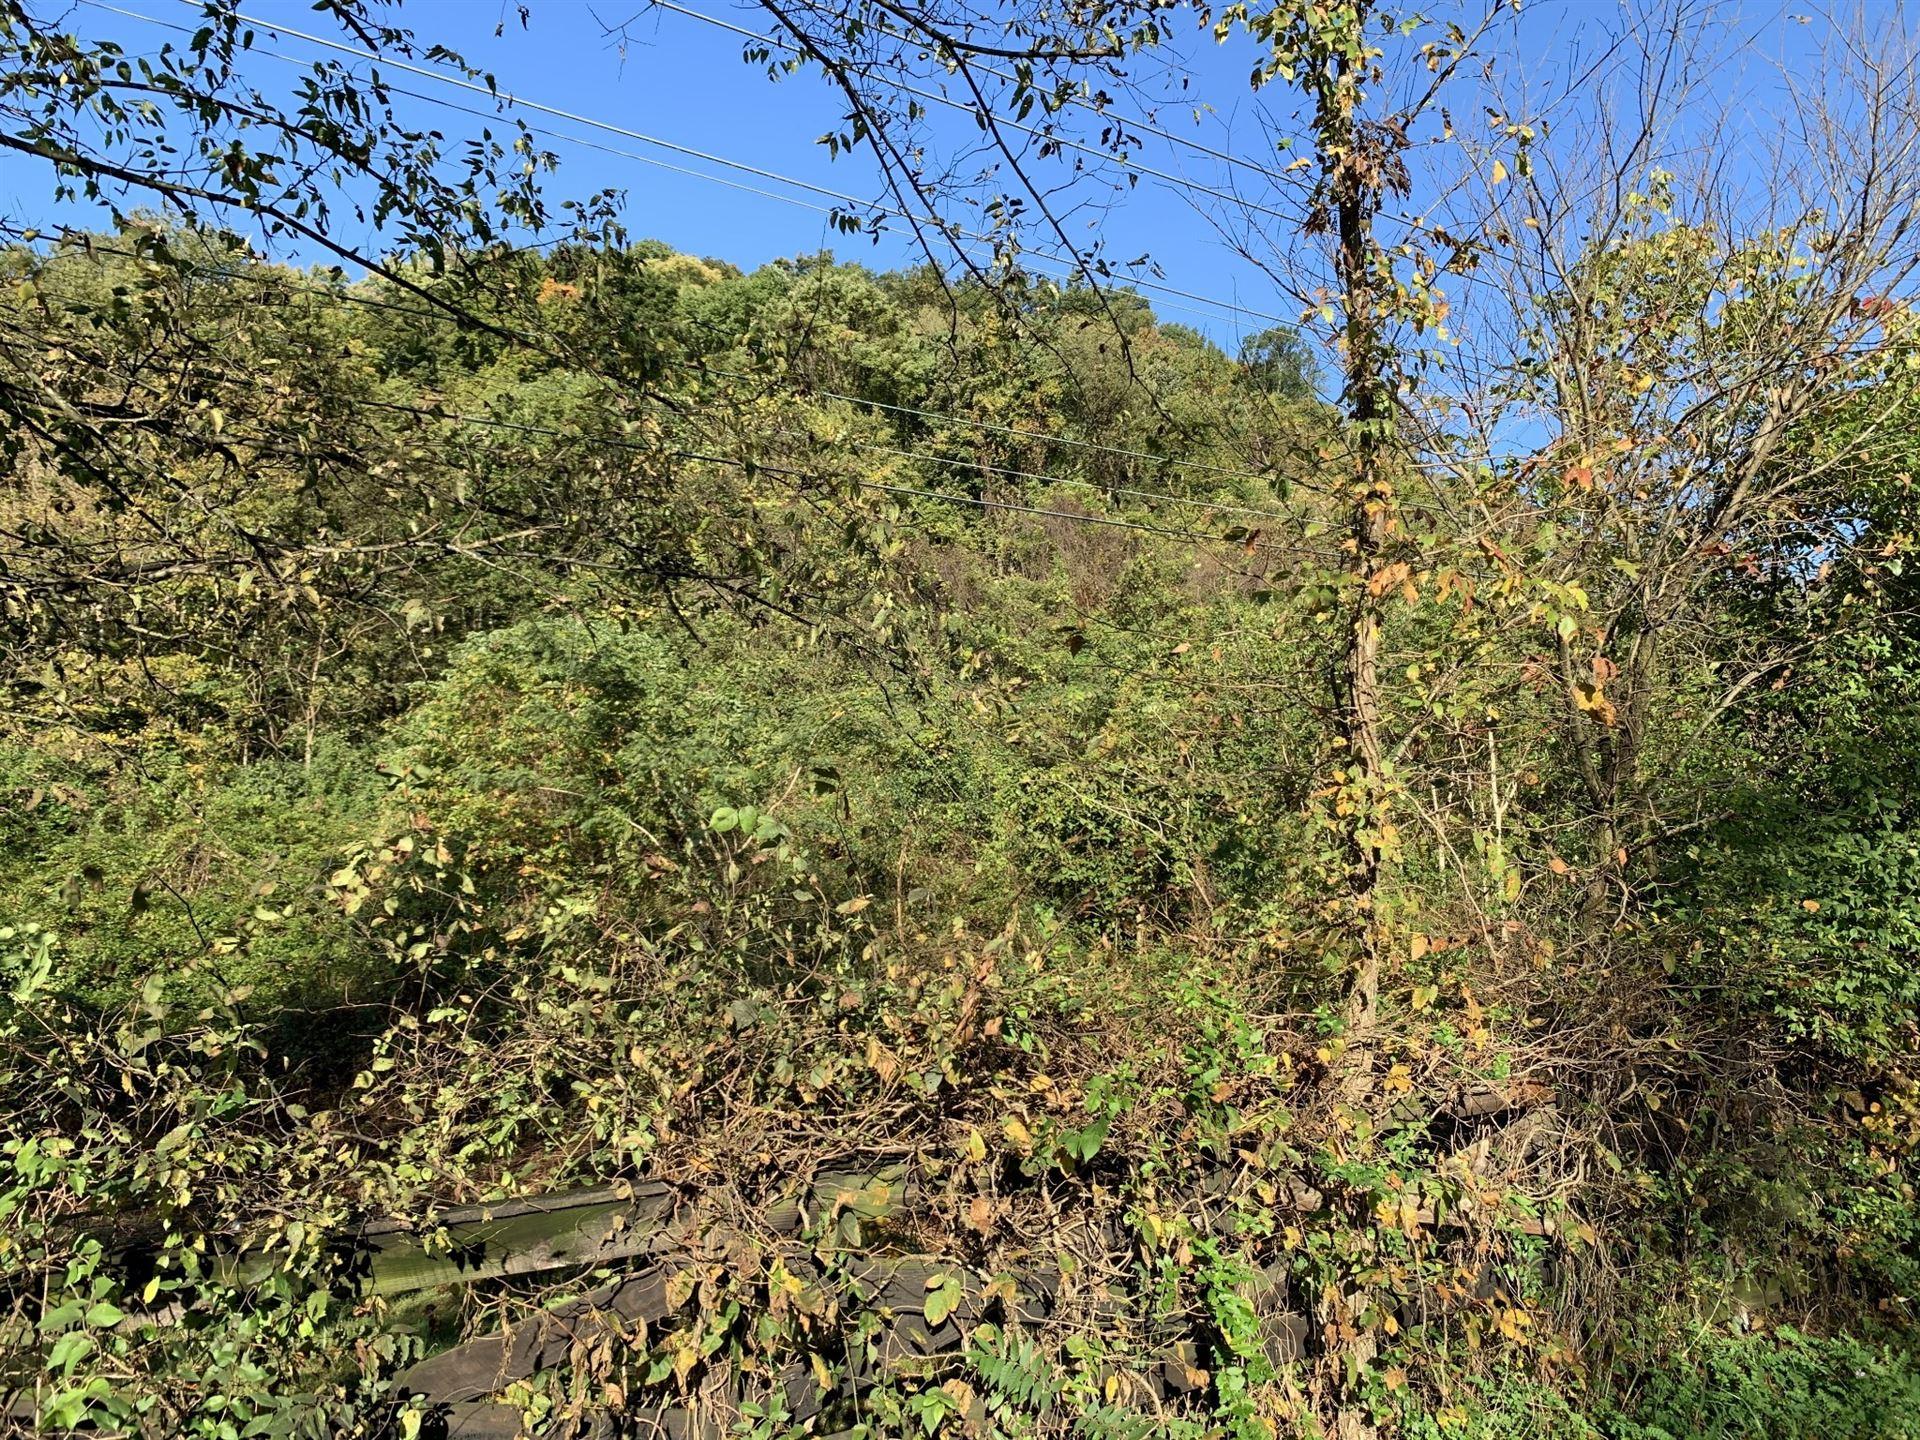 Photo of 1353 Holly Tree Gap Rd N, Brentwood, TN 37027 (MLS # 2222427)